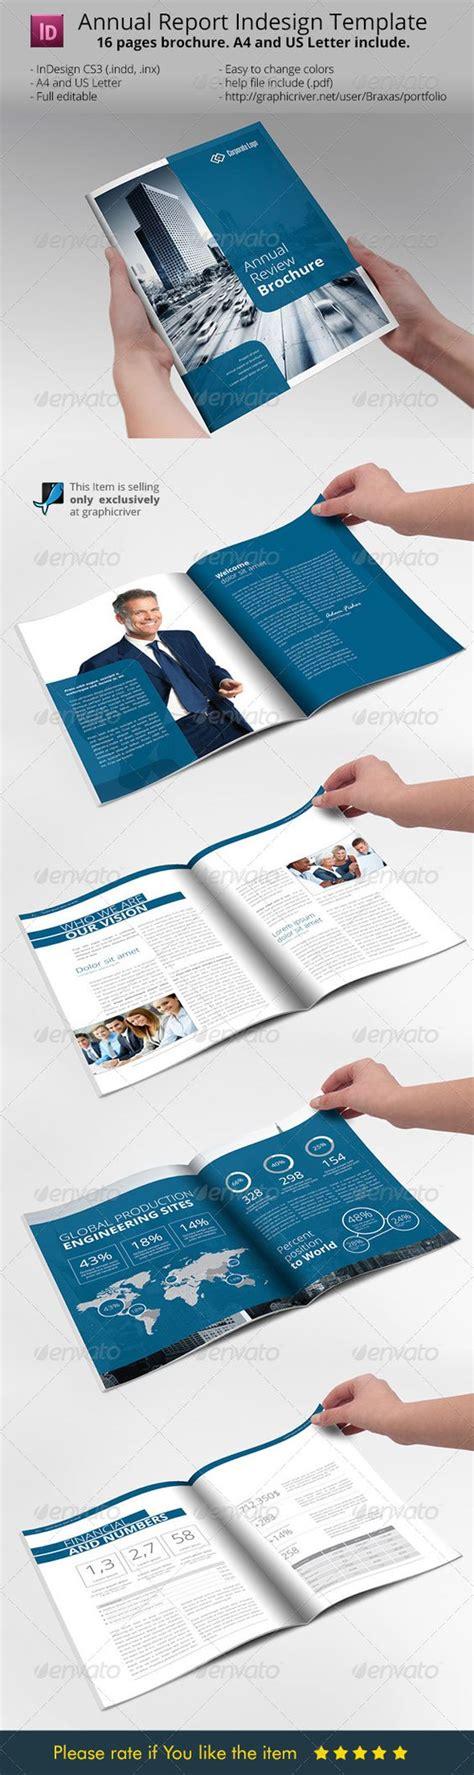 informational brochure templates annual report brochure indesign template design